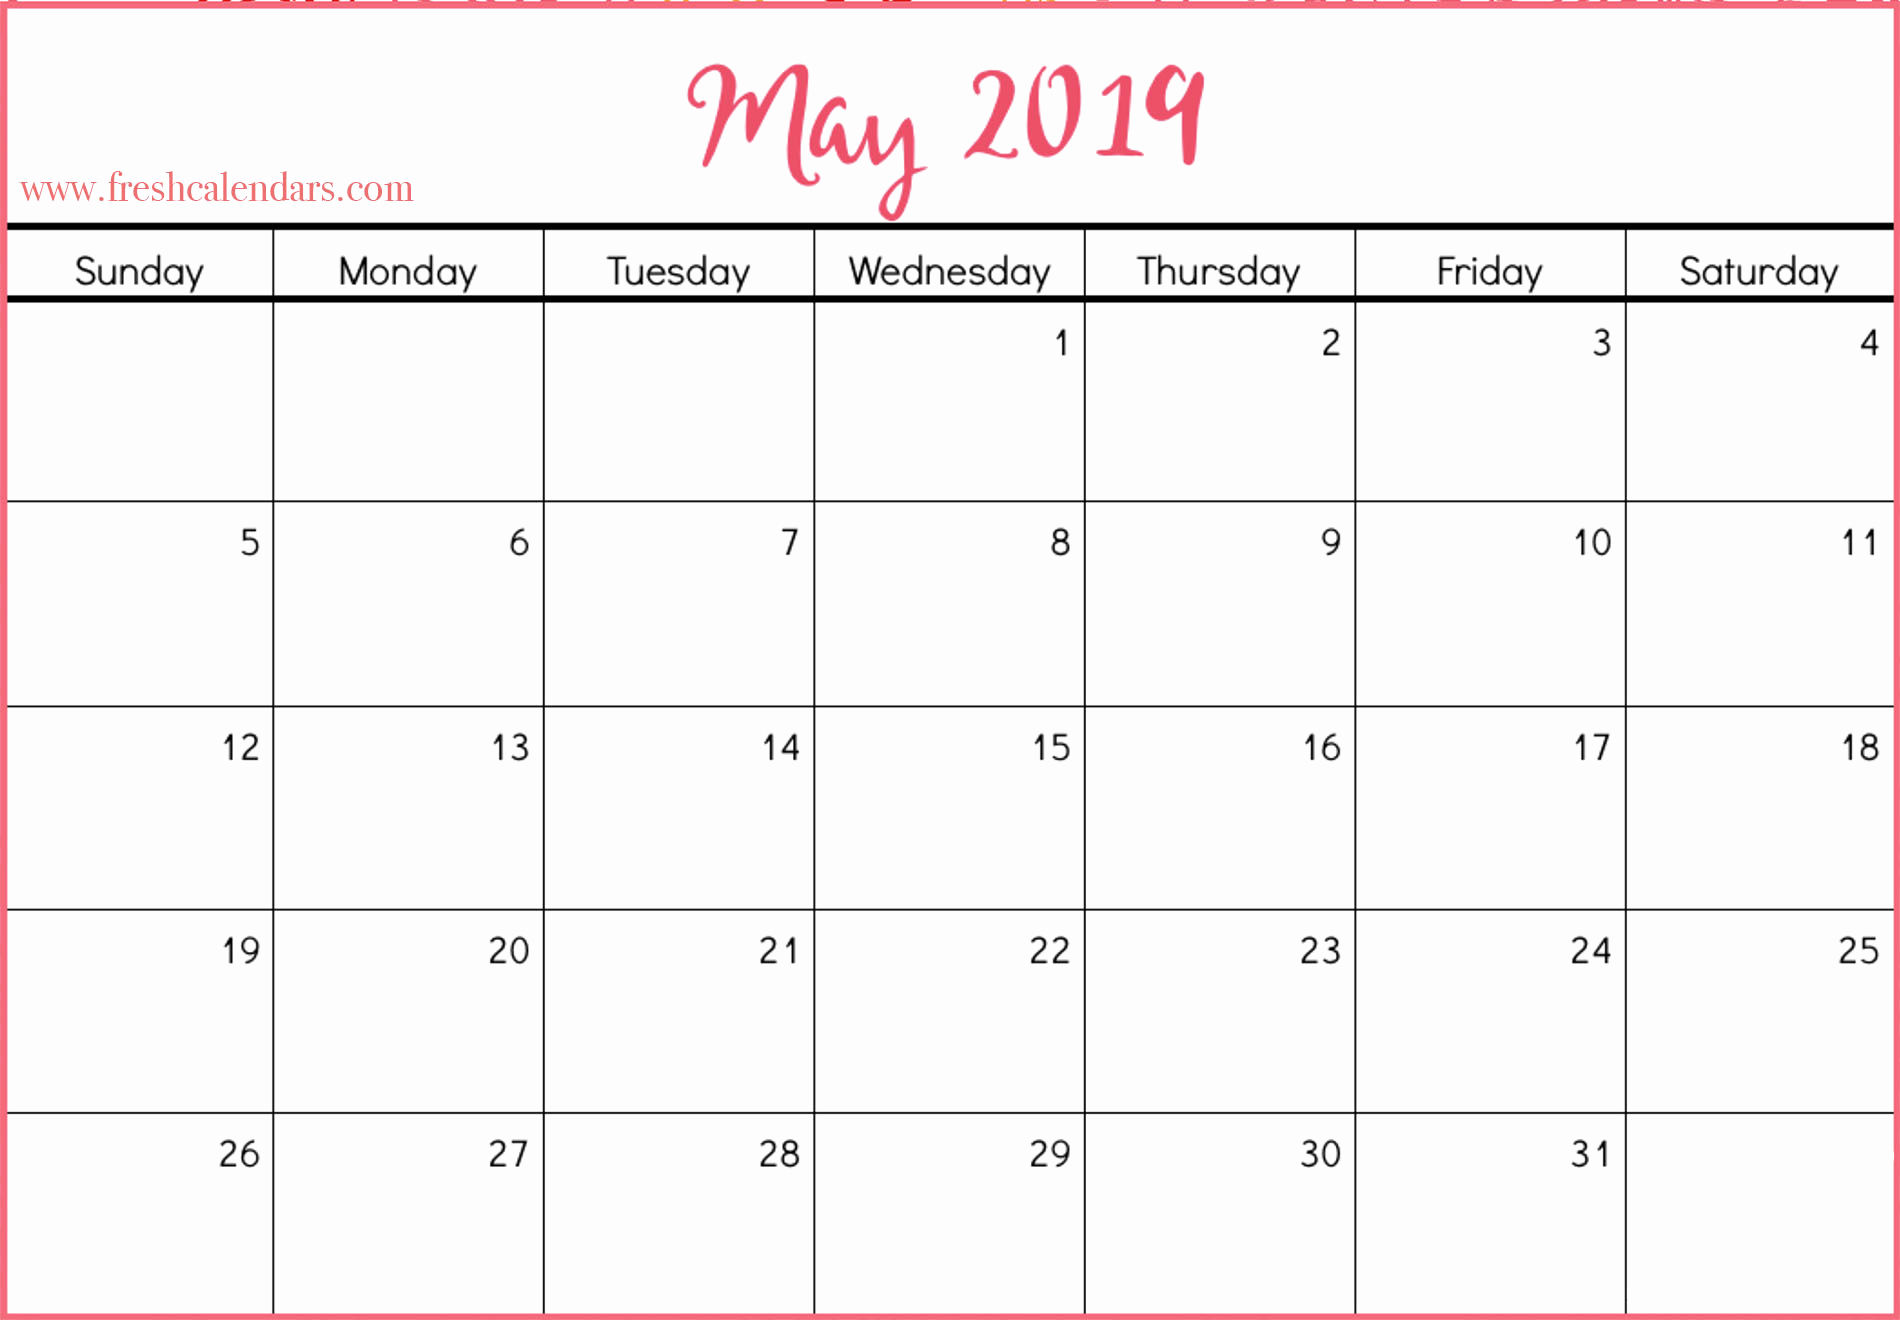 2019 Monthly Calendar Word Unique May 2019 Calendar Printable Fresh Calendars